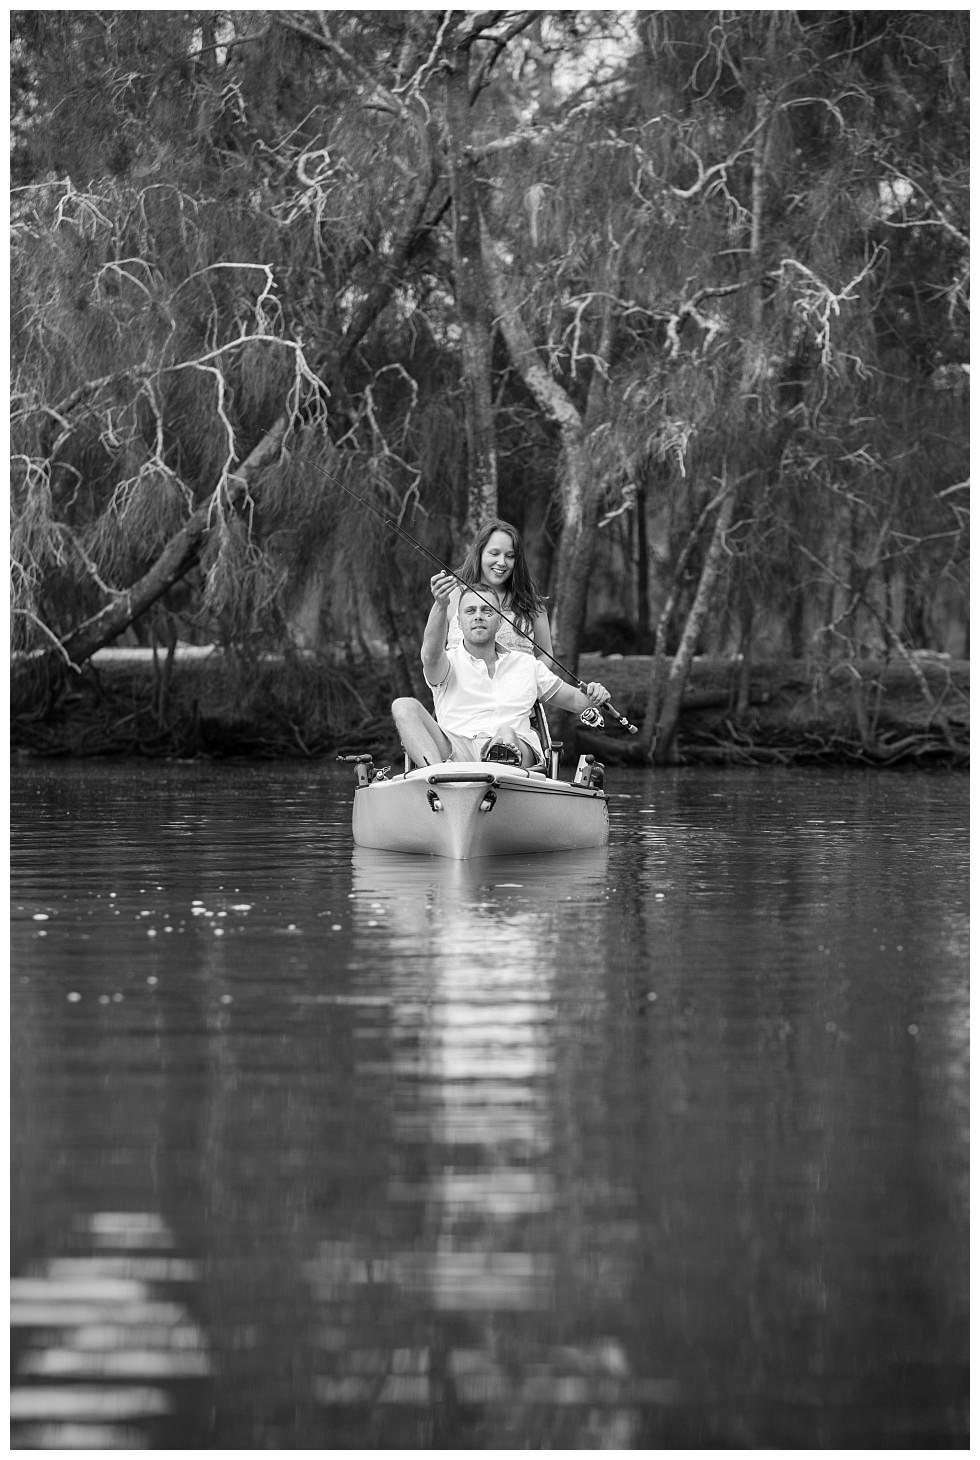 ArtyJ Photography | Sydney, Spring eShoot, Australia, NSW, eShoot, Engagement, Photography | Carolyn & Mark | eShoot